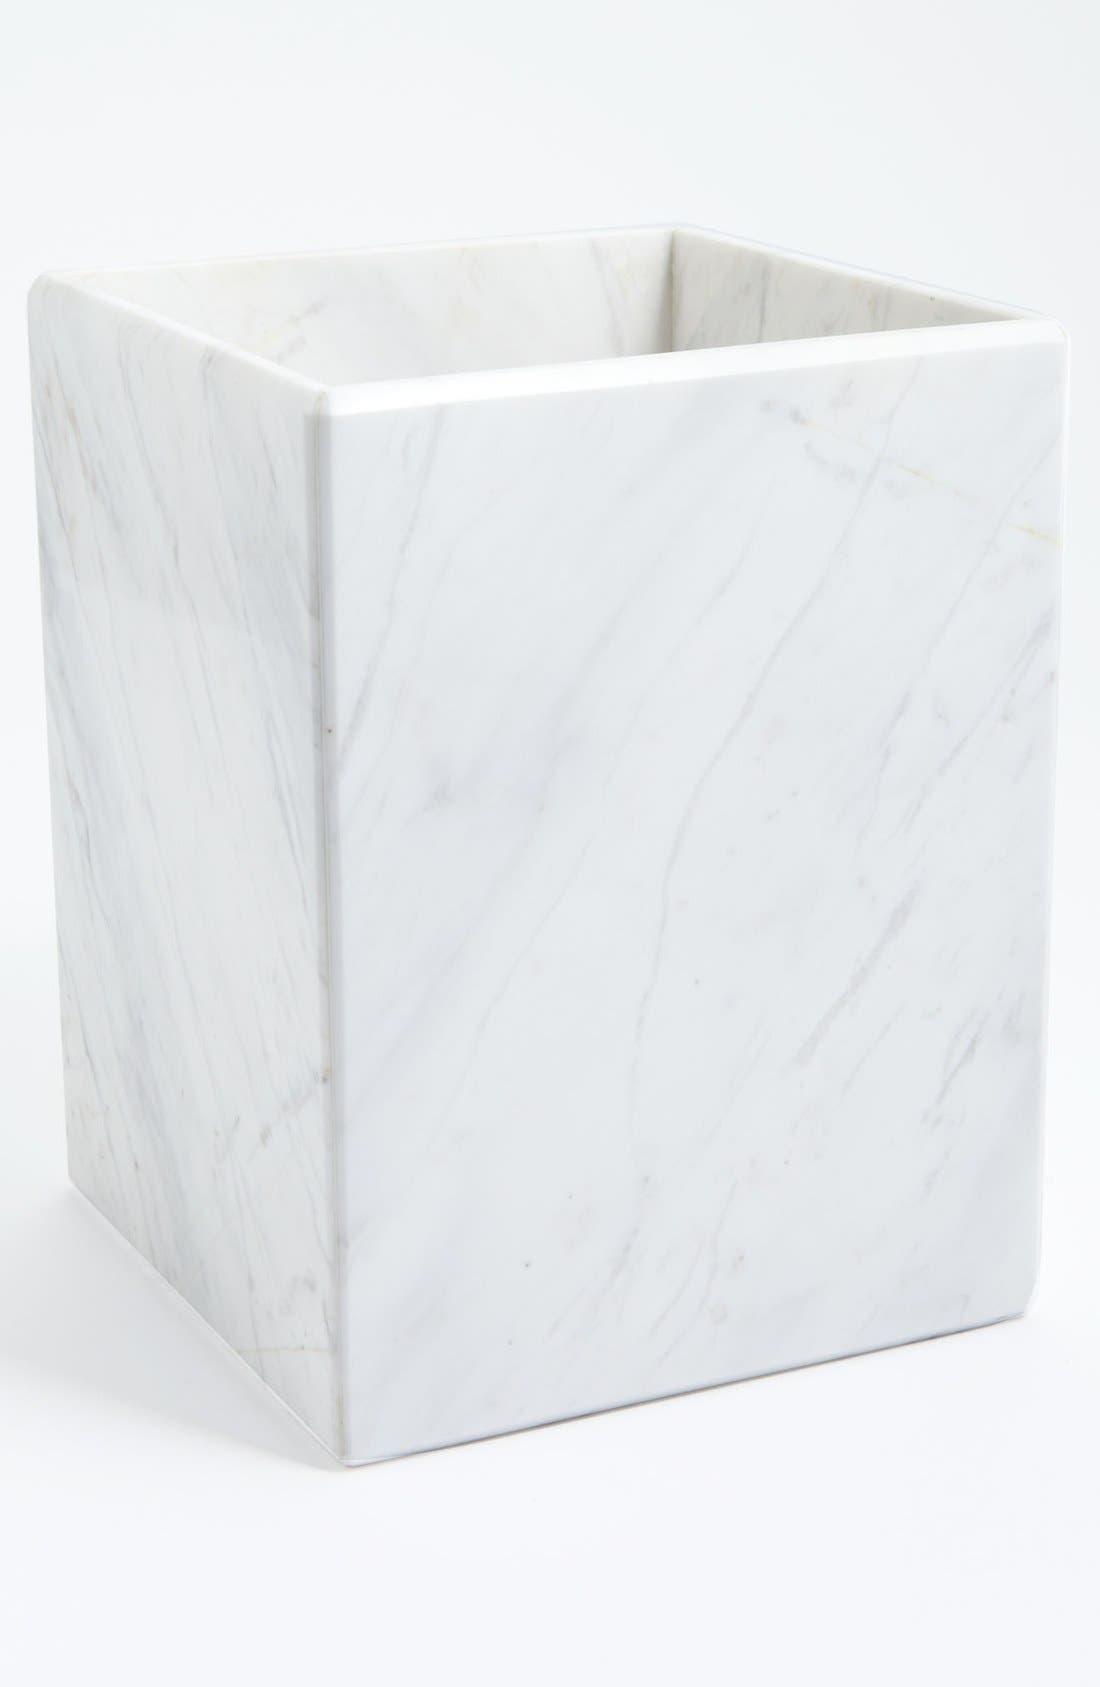 Alternate Image 1 Selected - Waterworks Studio 'Luna' White Marble Wastebasket (Online Only)